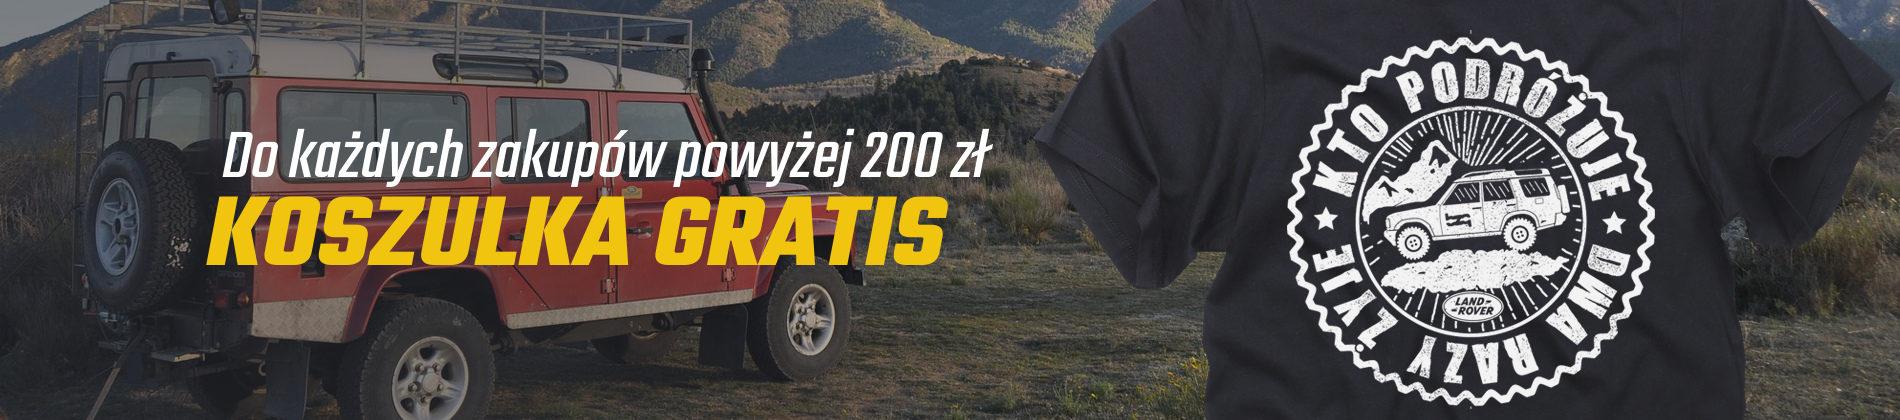 Lan Rover koszulki v2